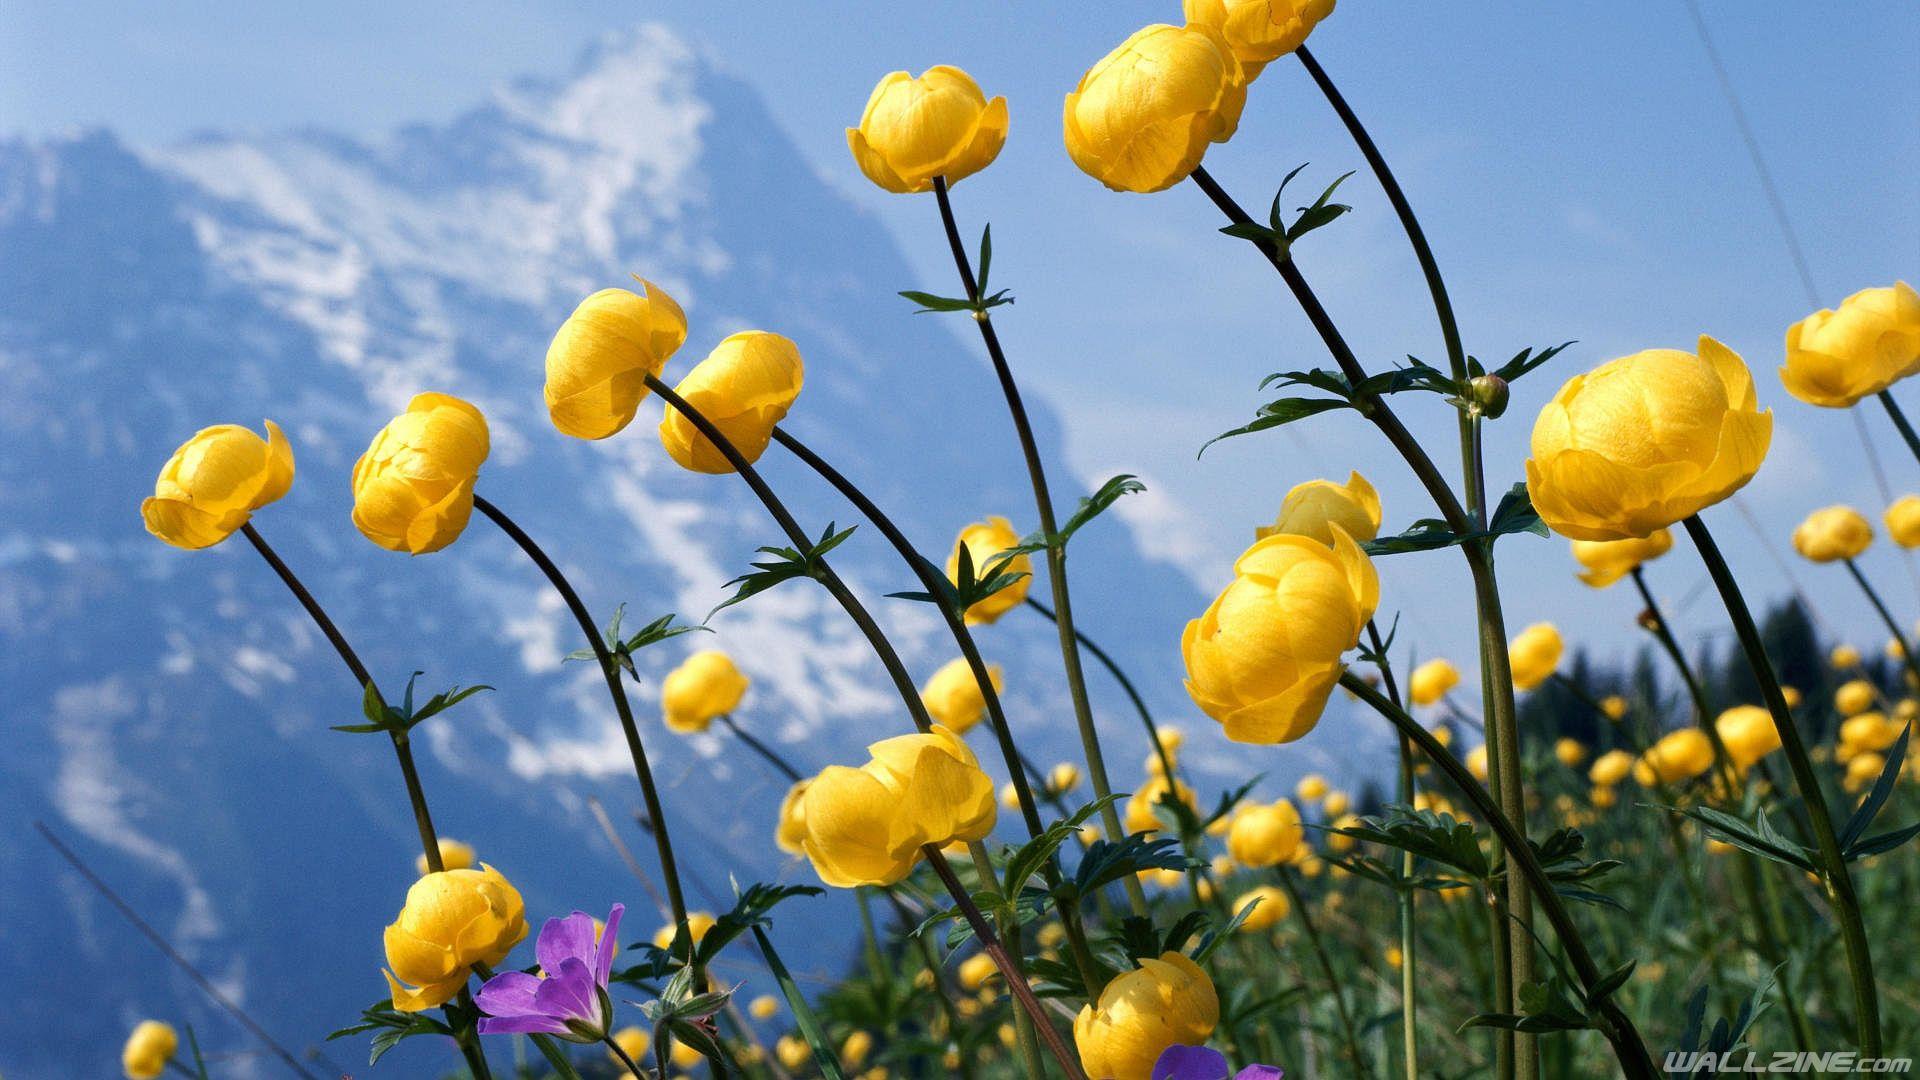 Free Wildflowers Hd Desktop Wallpaper Wallzine Com Alpine Flowers Perennial Plants Flower Images Wallpapers